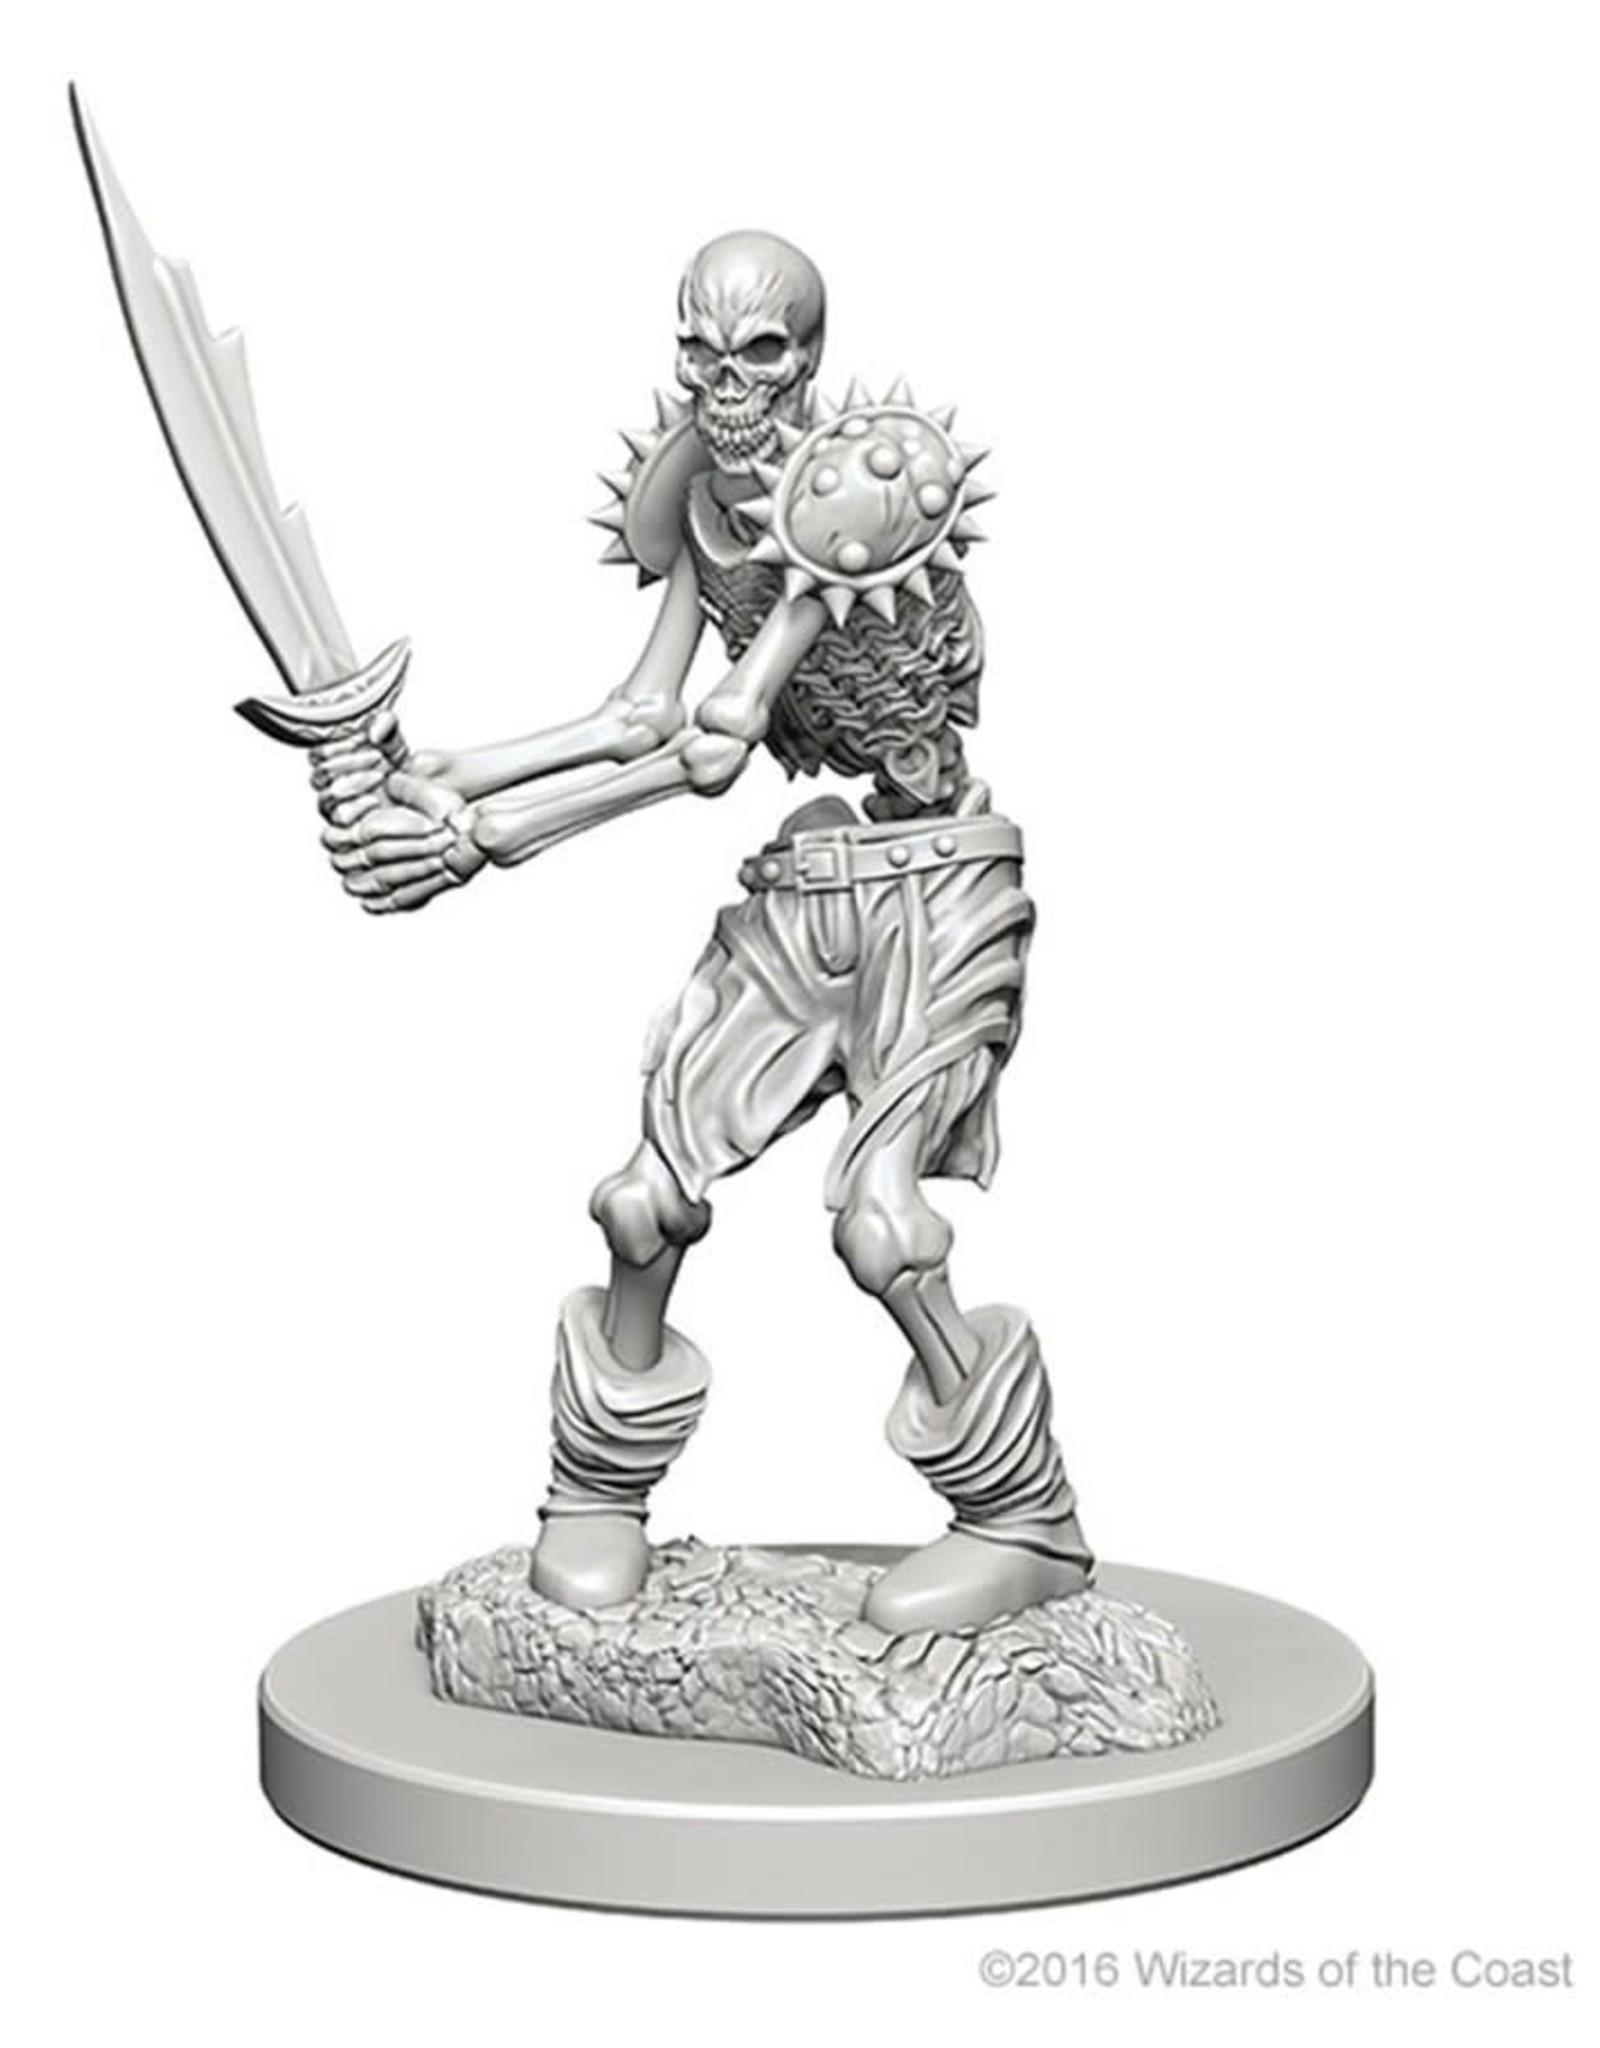 WizKids Dungeons & Dragons Nolzur's Marvelous Miniatures: Skeletons